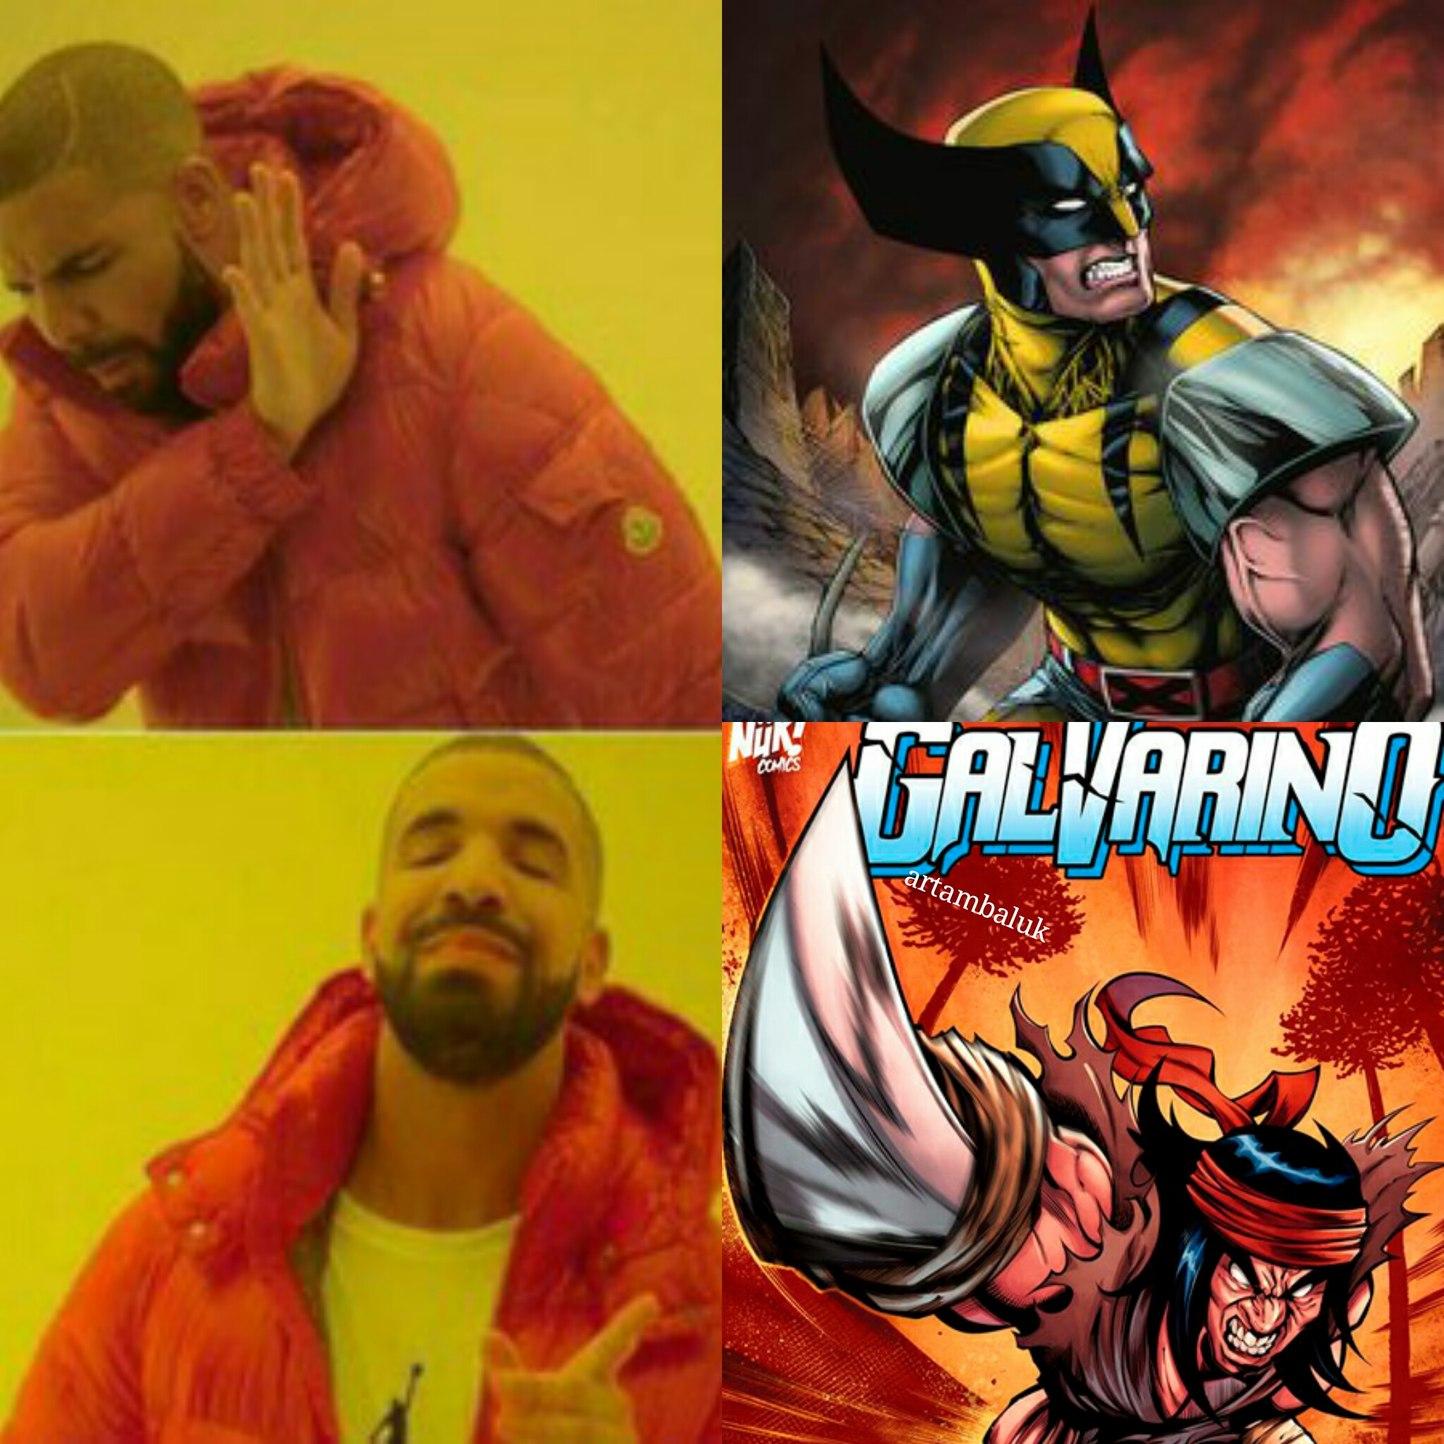 Galvarino supera a wolverine - meme